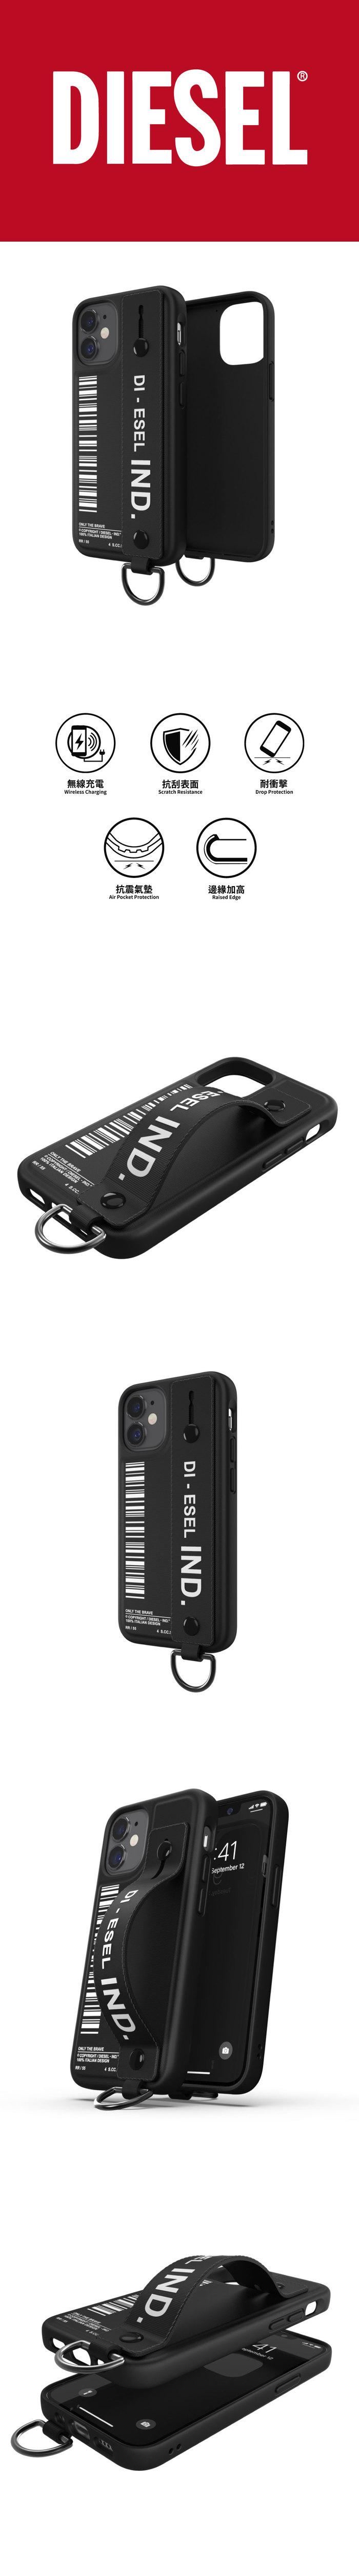 Diesel iPhone 12 mini 手機殼 支架扣環